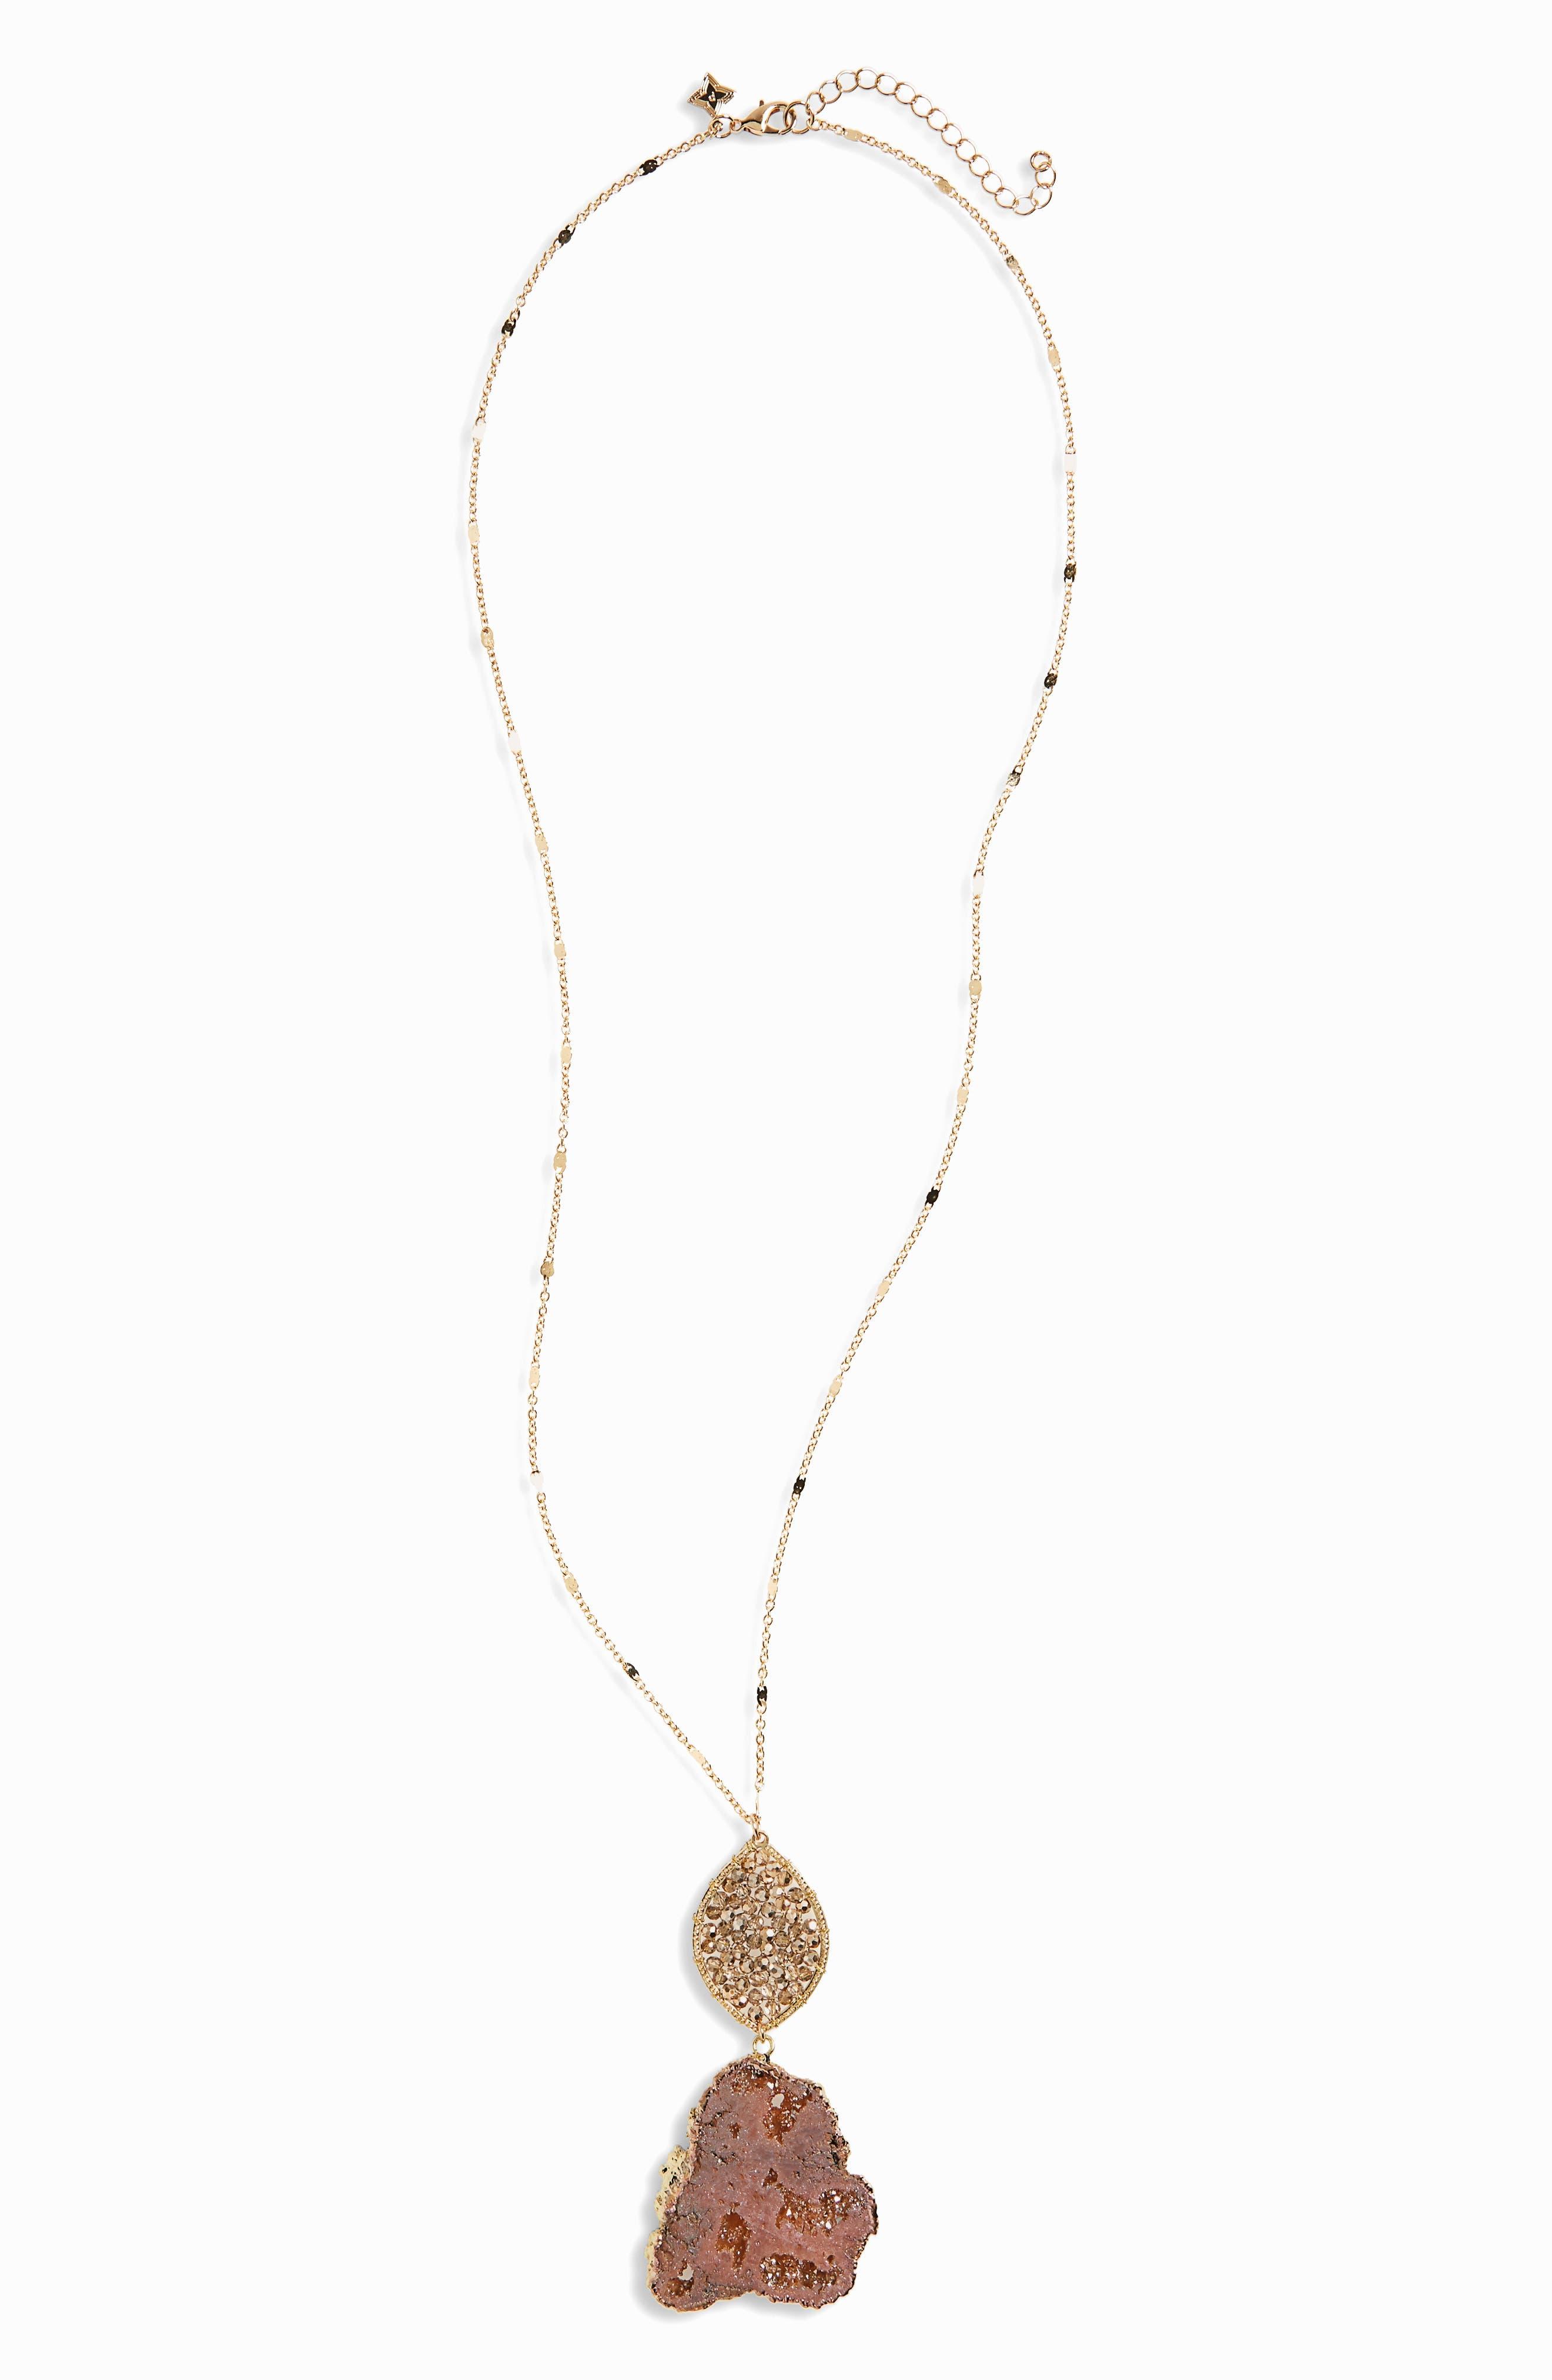 Agate Beaded Pendant Necklace,                         Main,                         color, Peach